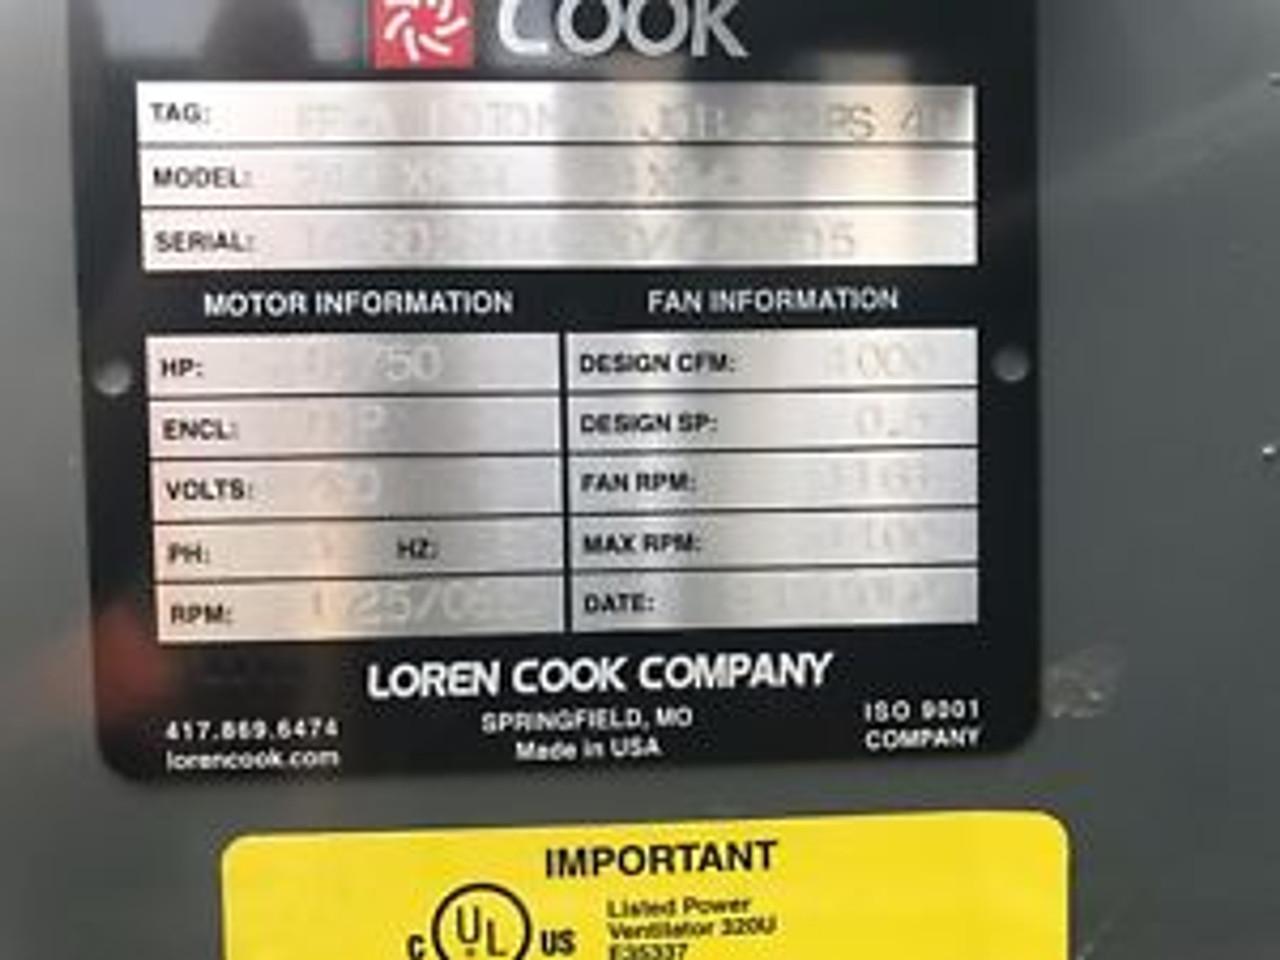 new cook ventilation exhaust fan xmwh